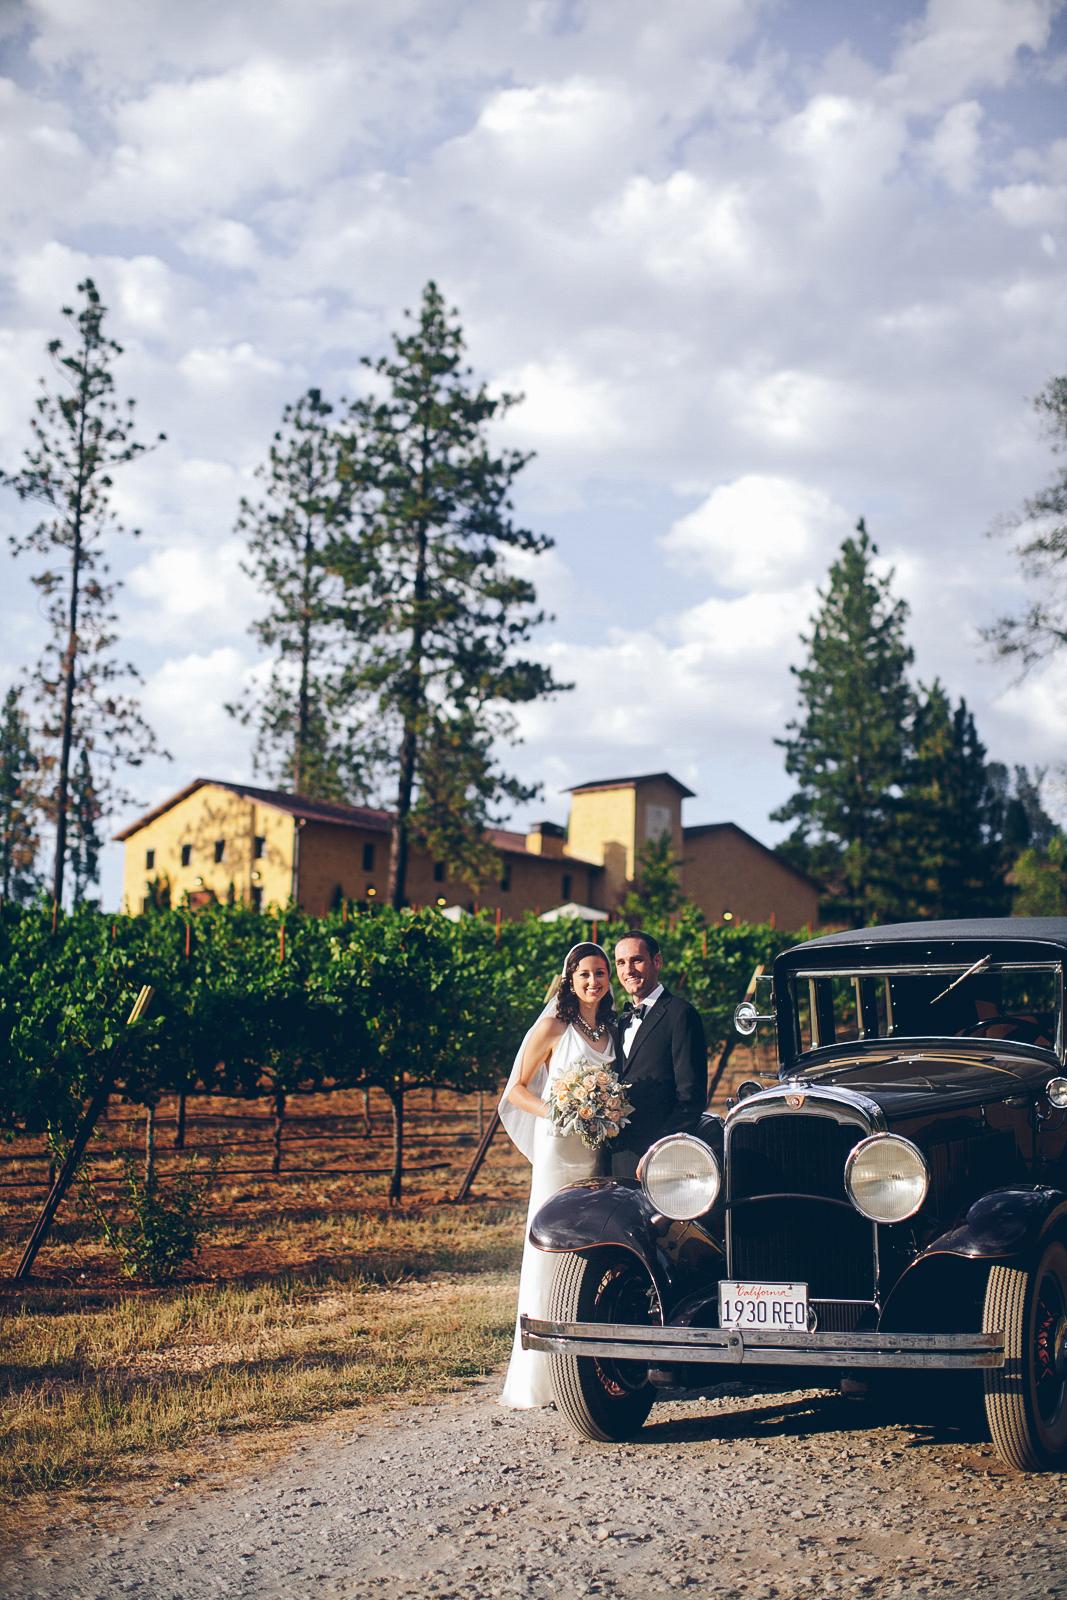 miraflores_winery_wedding_photography_ian_melissa_ebony_siovhan_bokeh_photography_40.jpg